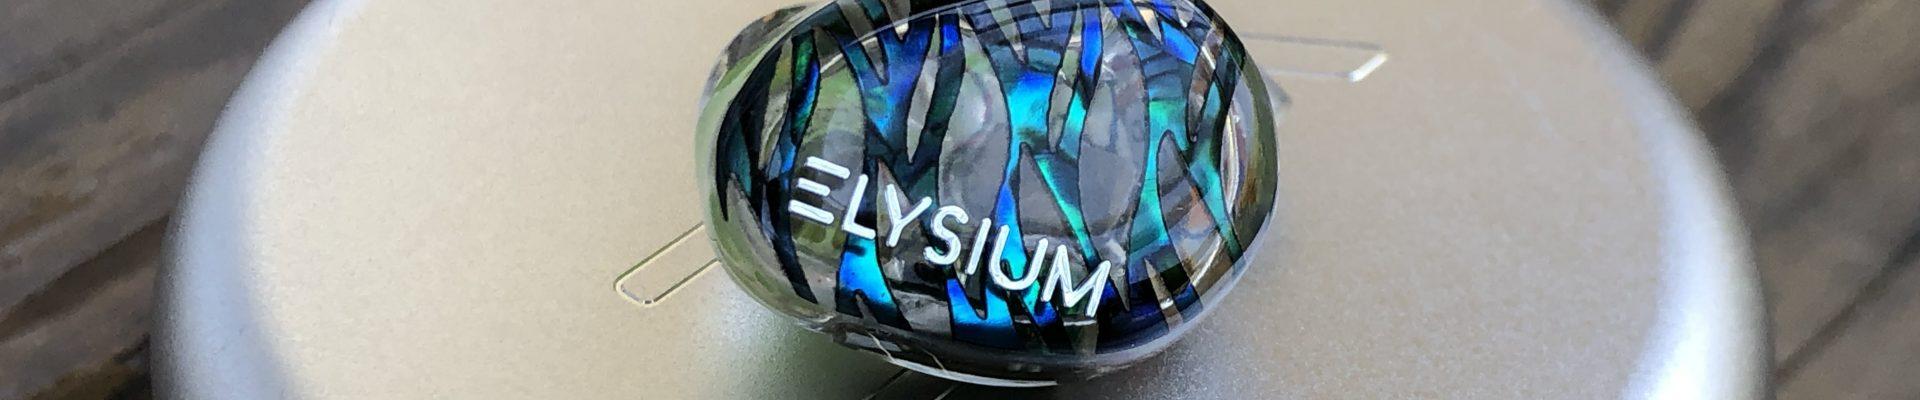 Vision Ears Elysium Review: Exorbitance